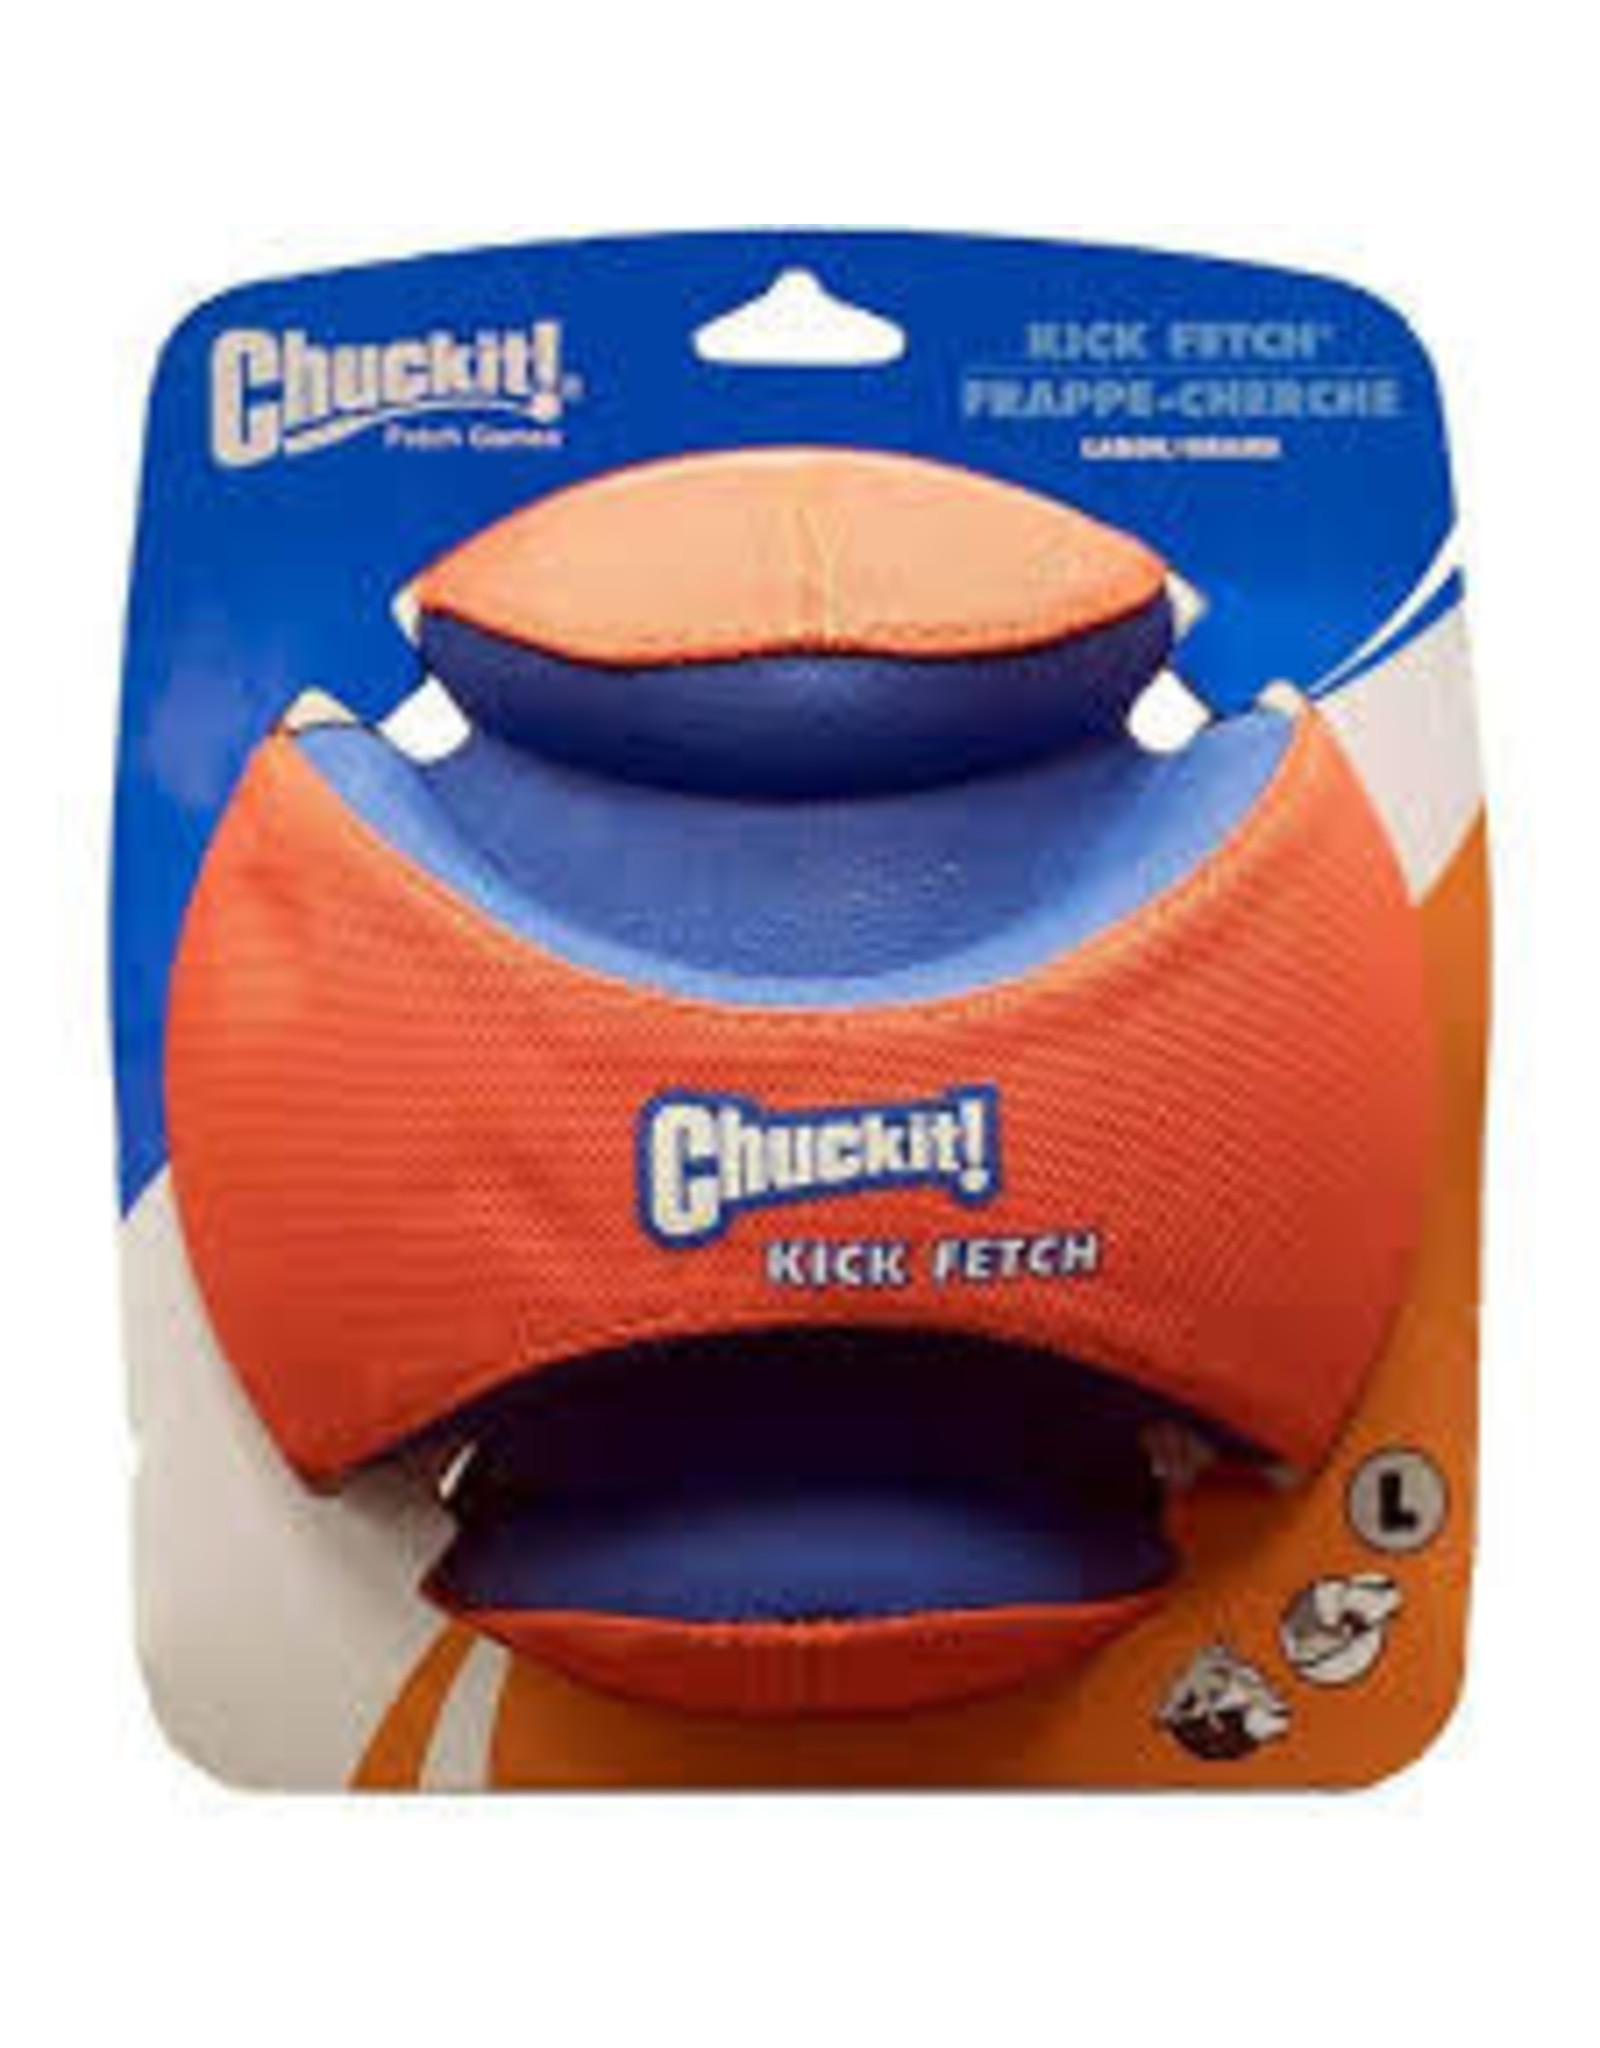 Chuck It! Chuck it! - Kick Fetch